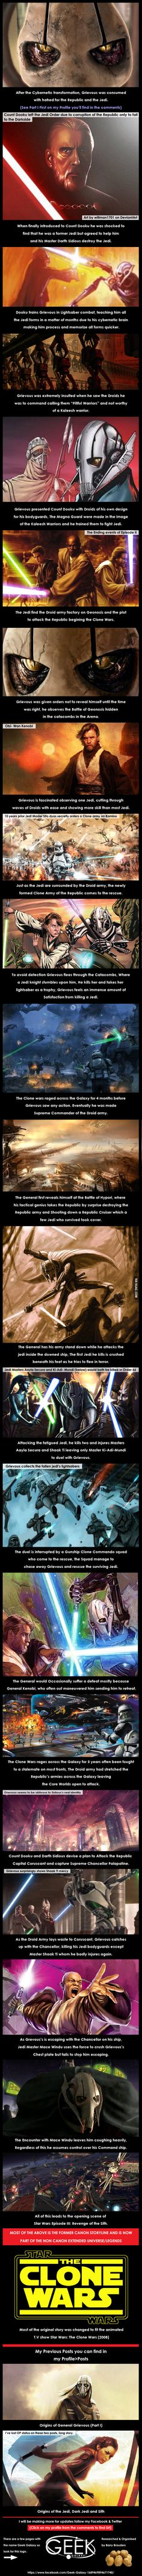 Origins of General Grievous (Part II) Star Wars History - 9GAG